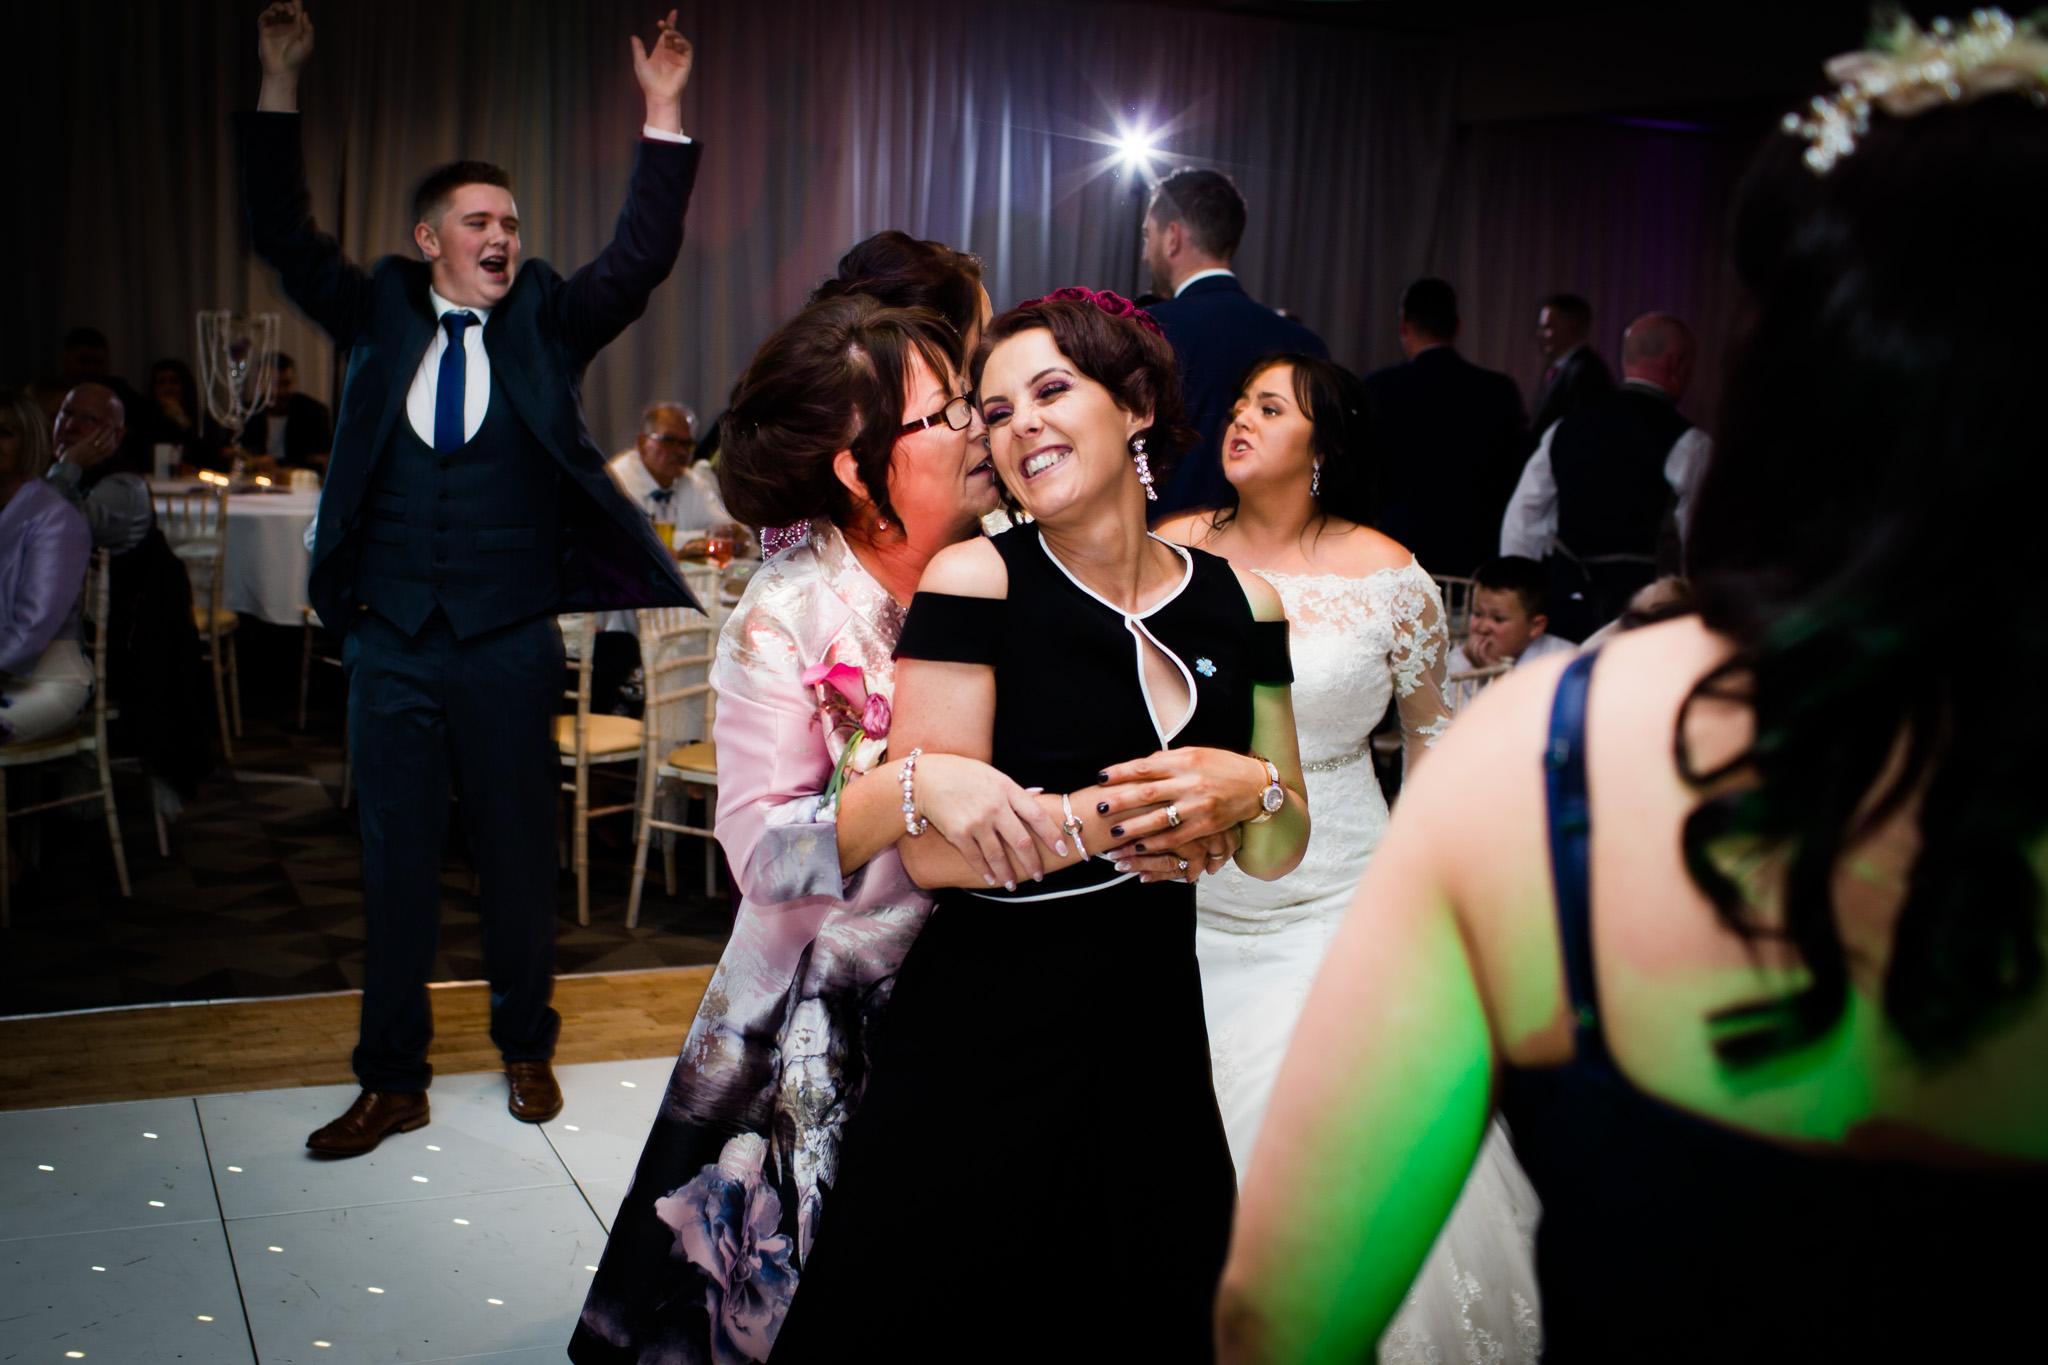 Mark_Barnes_Northern_Ireland_Wedding_Photography_Marine_hotel_ballycastle_Wedding_Photography_Janet&Darren-44.jpg